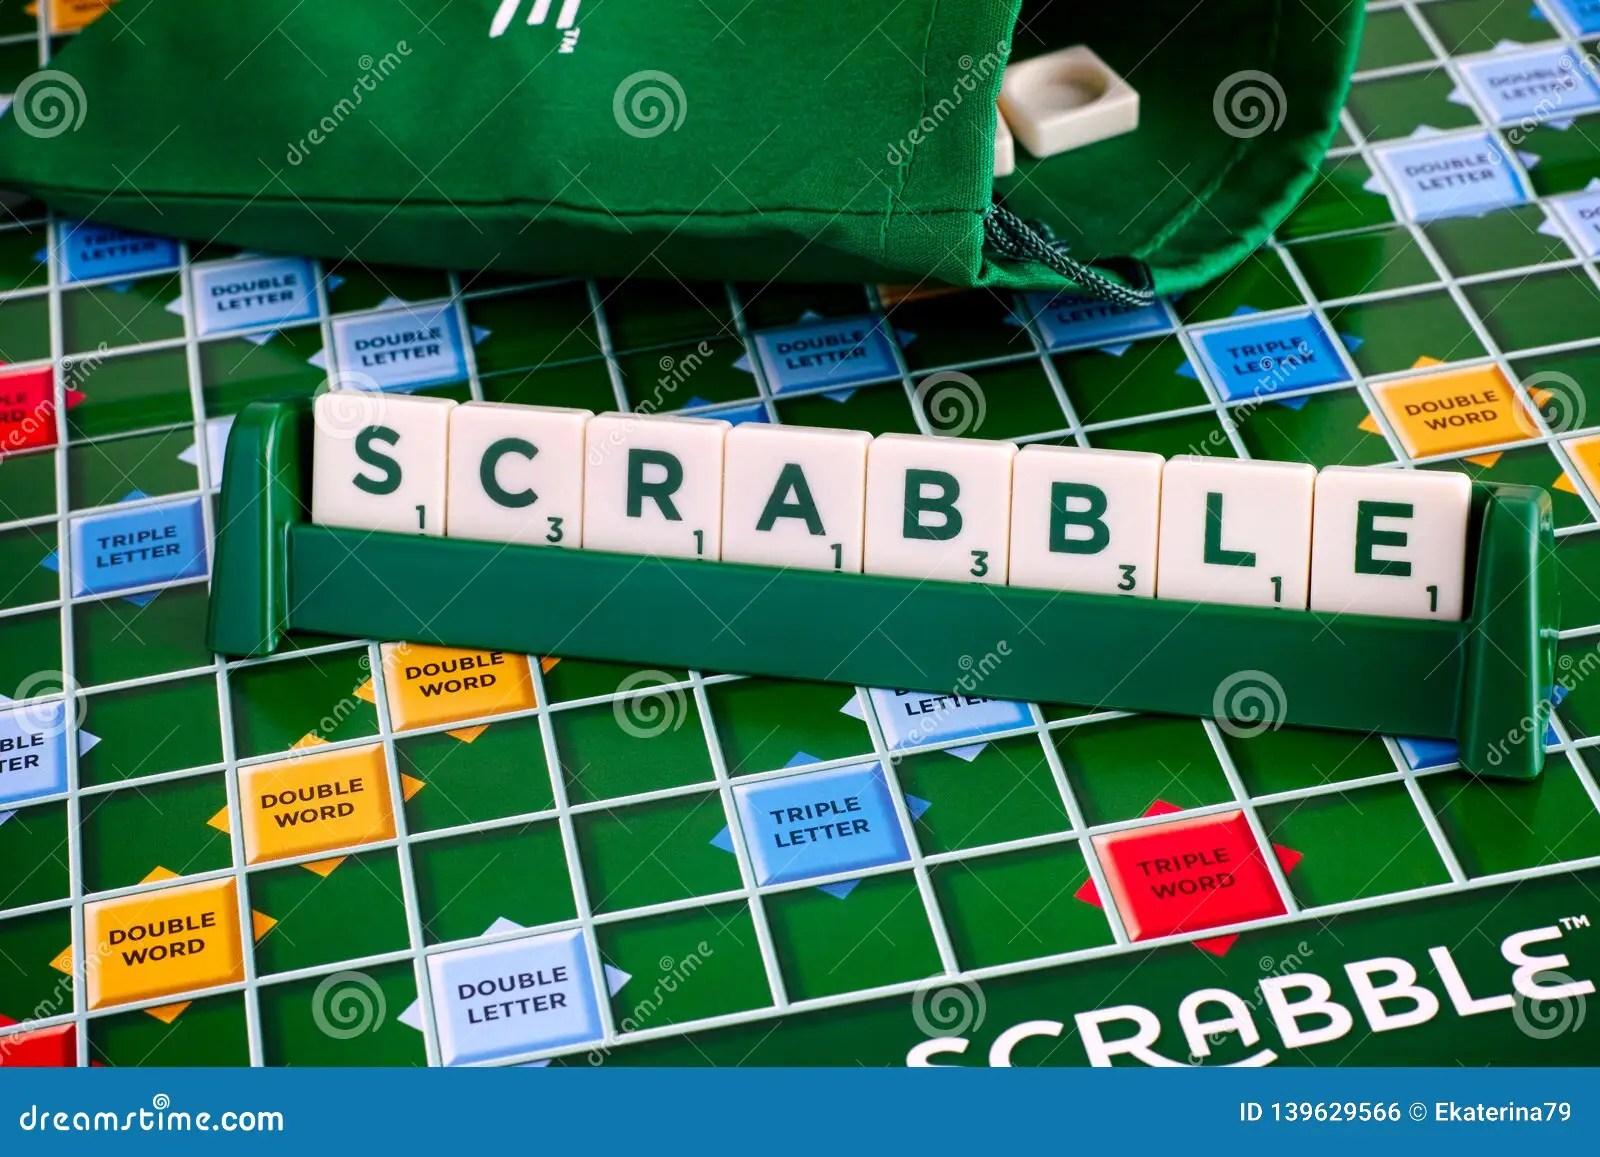 https www dreamstime com scrabble board game word scrabble letter tiles tile rack game board drawstring letter bag tambov russian image139629566